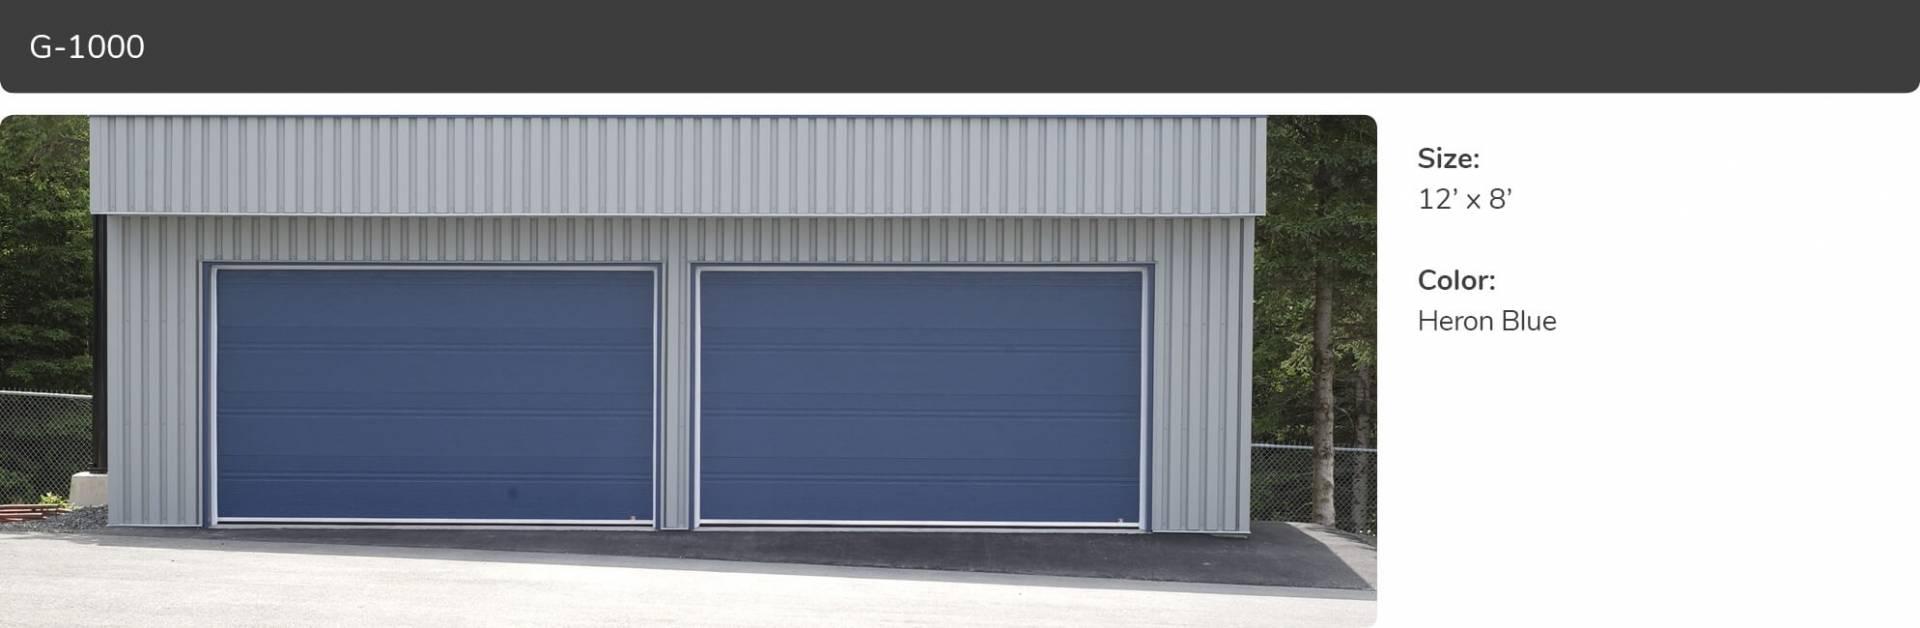 G 1000 commercial garage door manufacturer garaga g 1000 12 x 8 heron blue rubansaba